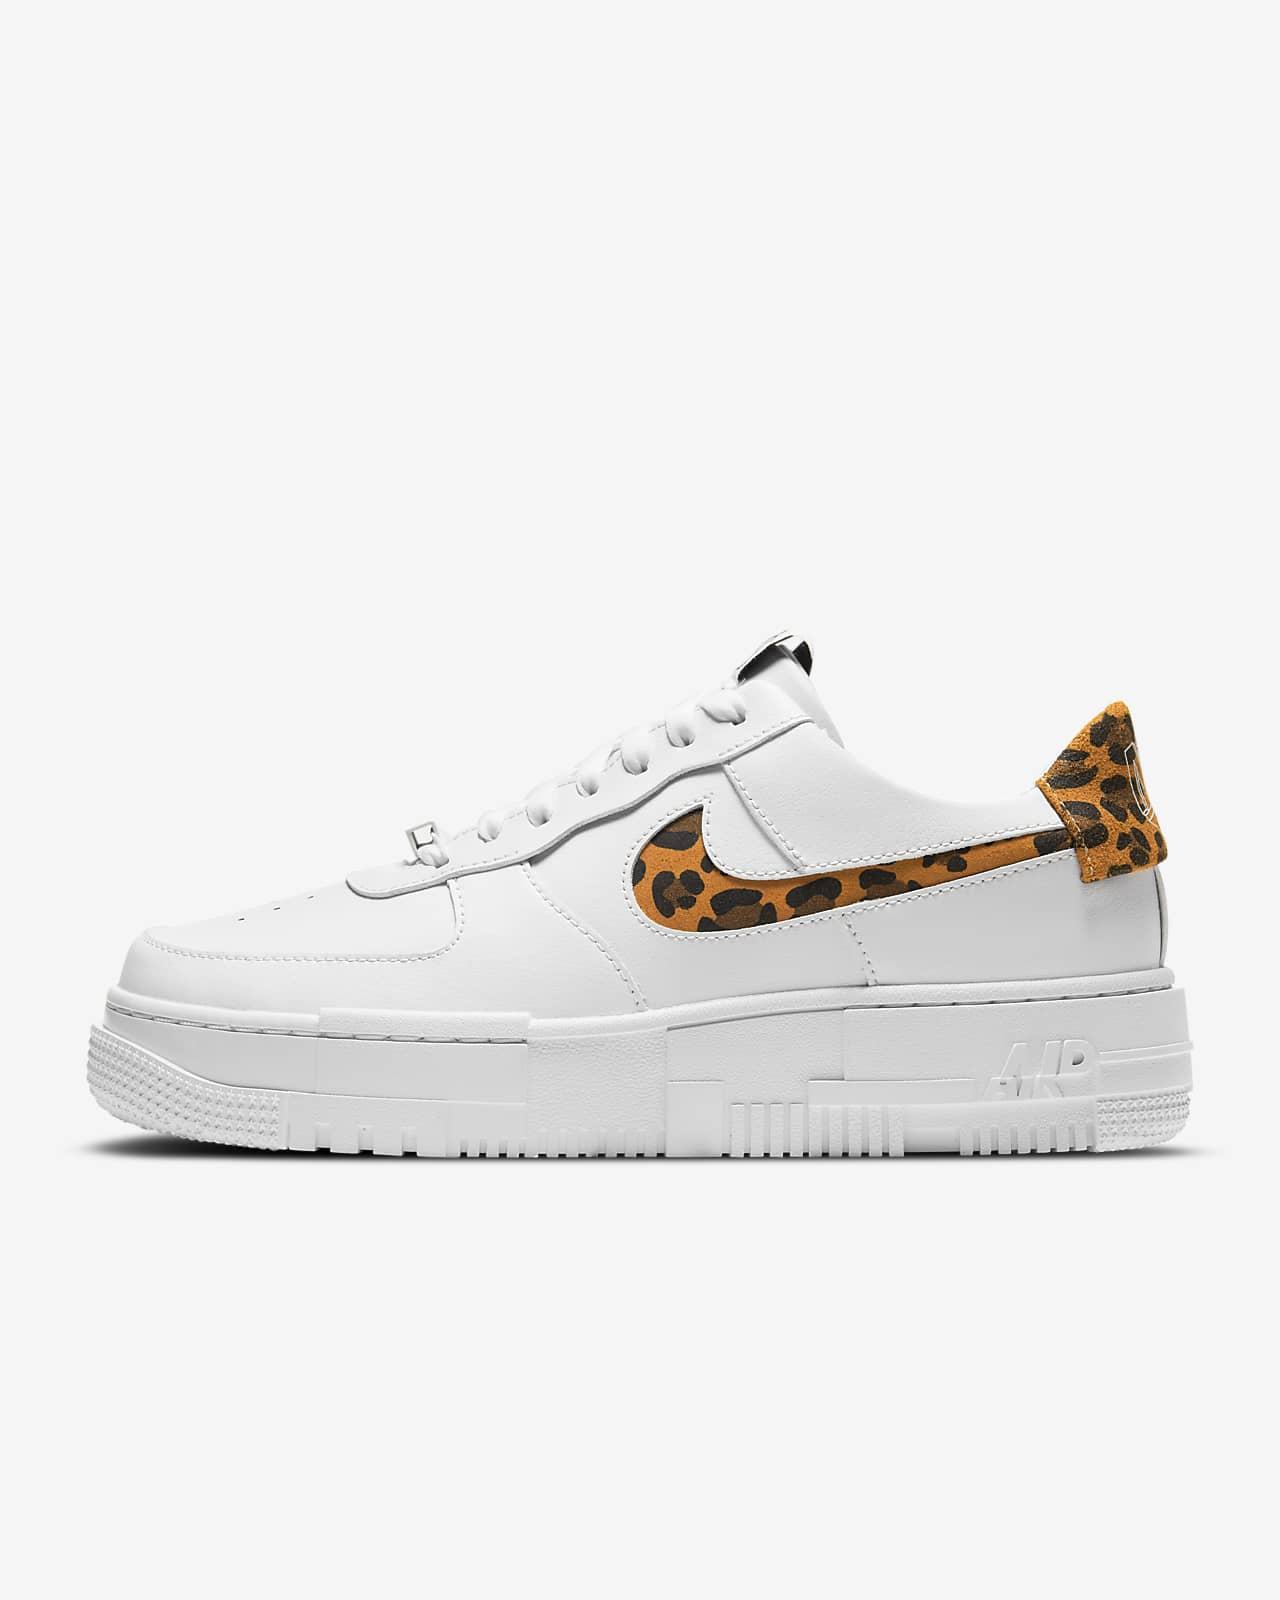 Chaussure Nike AF1 Pixel SE pour Femme